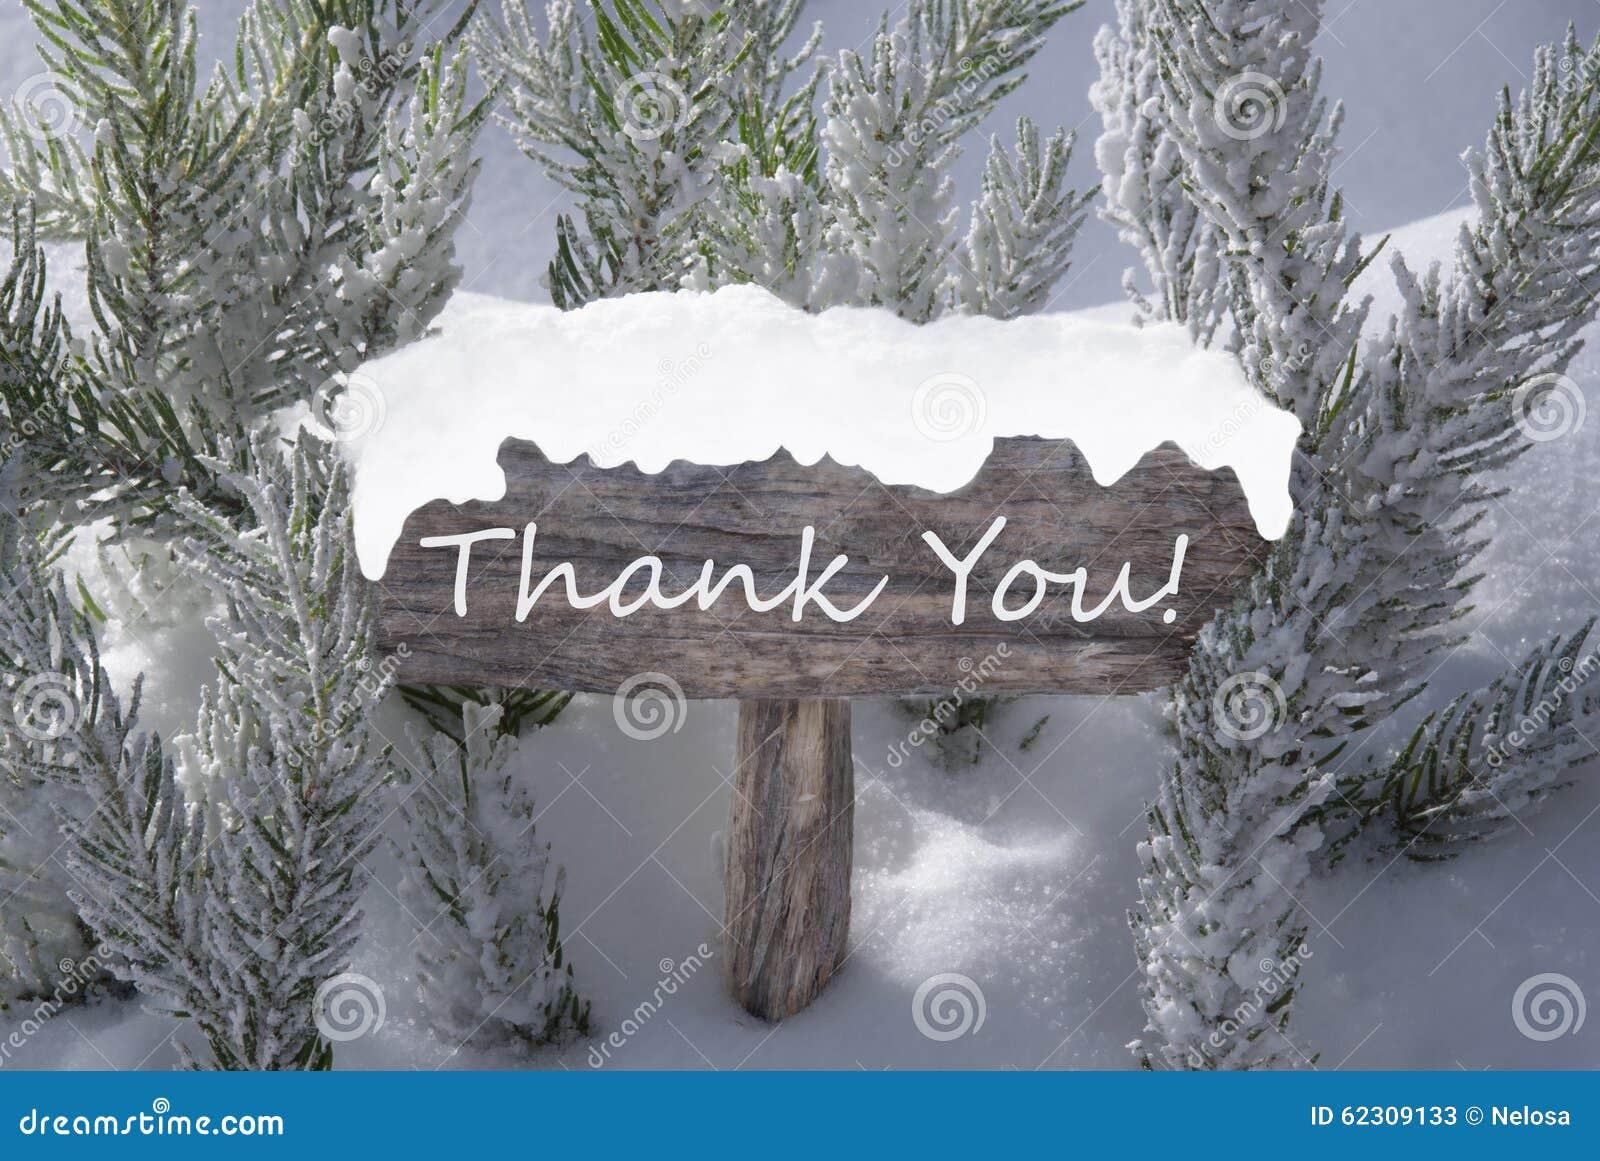 Christmas Sign Snow Fir Tree Branch Text Thank You Stock